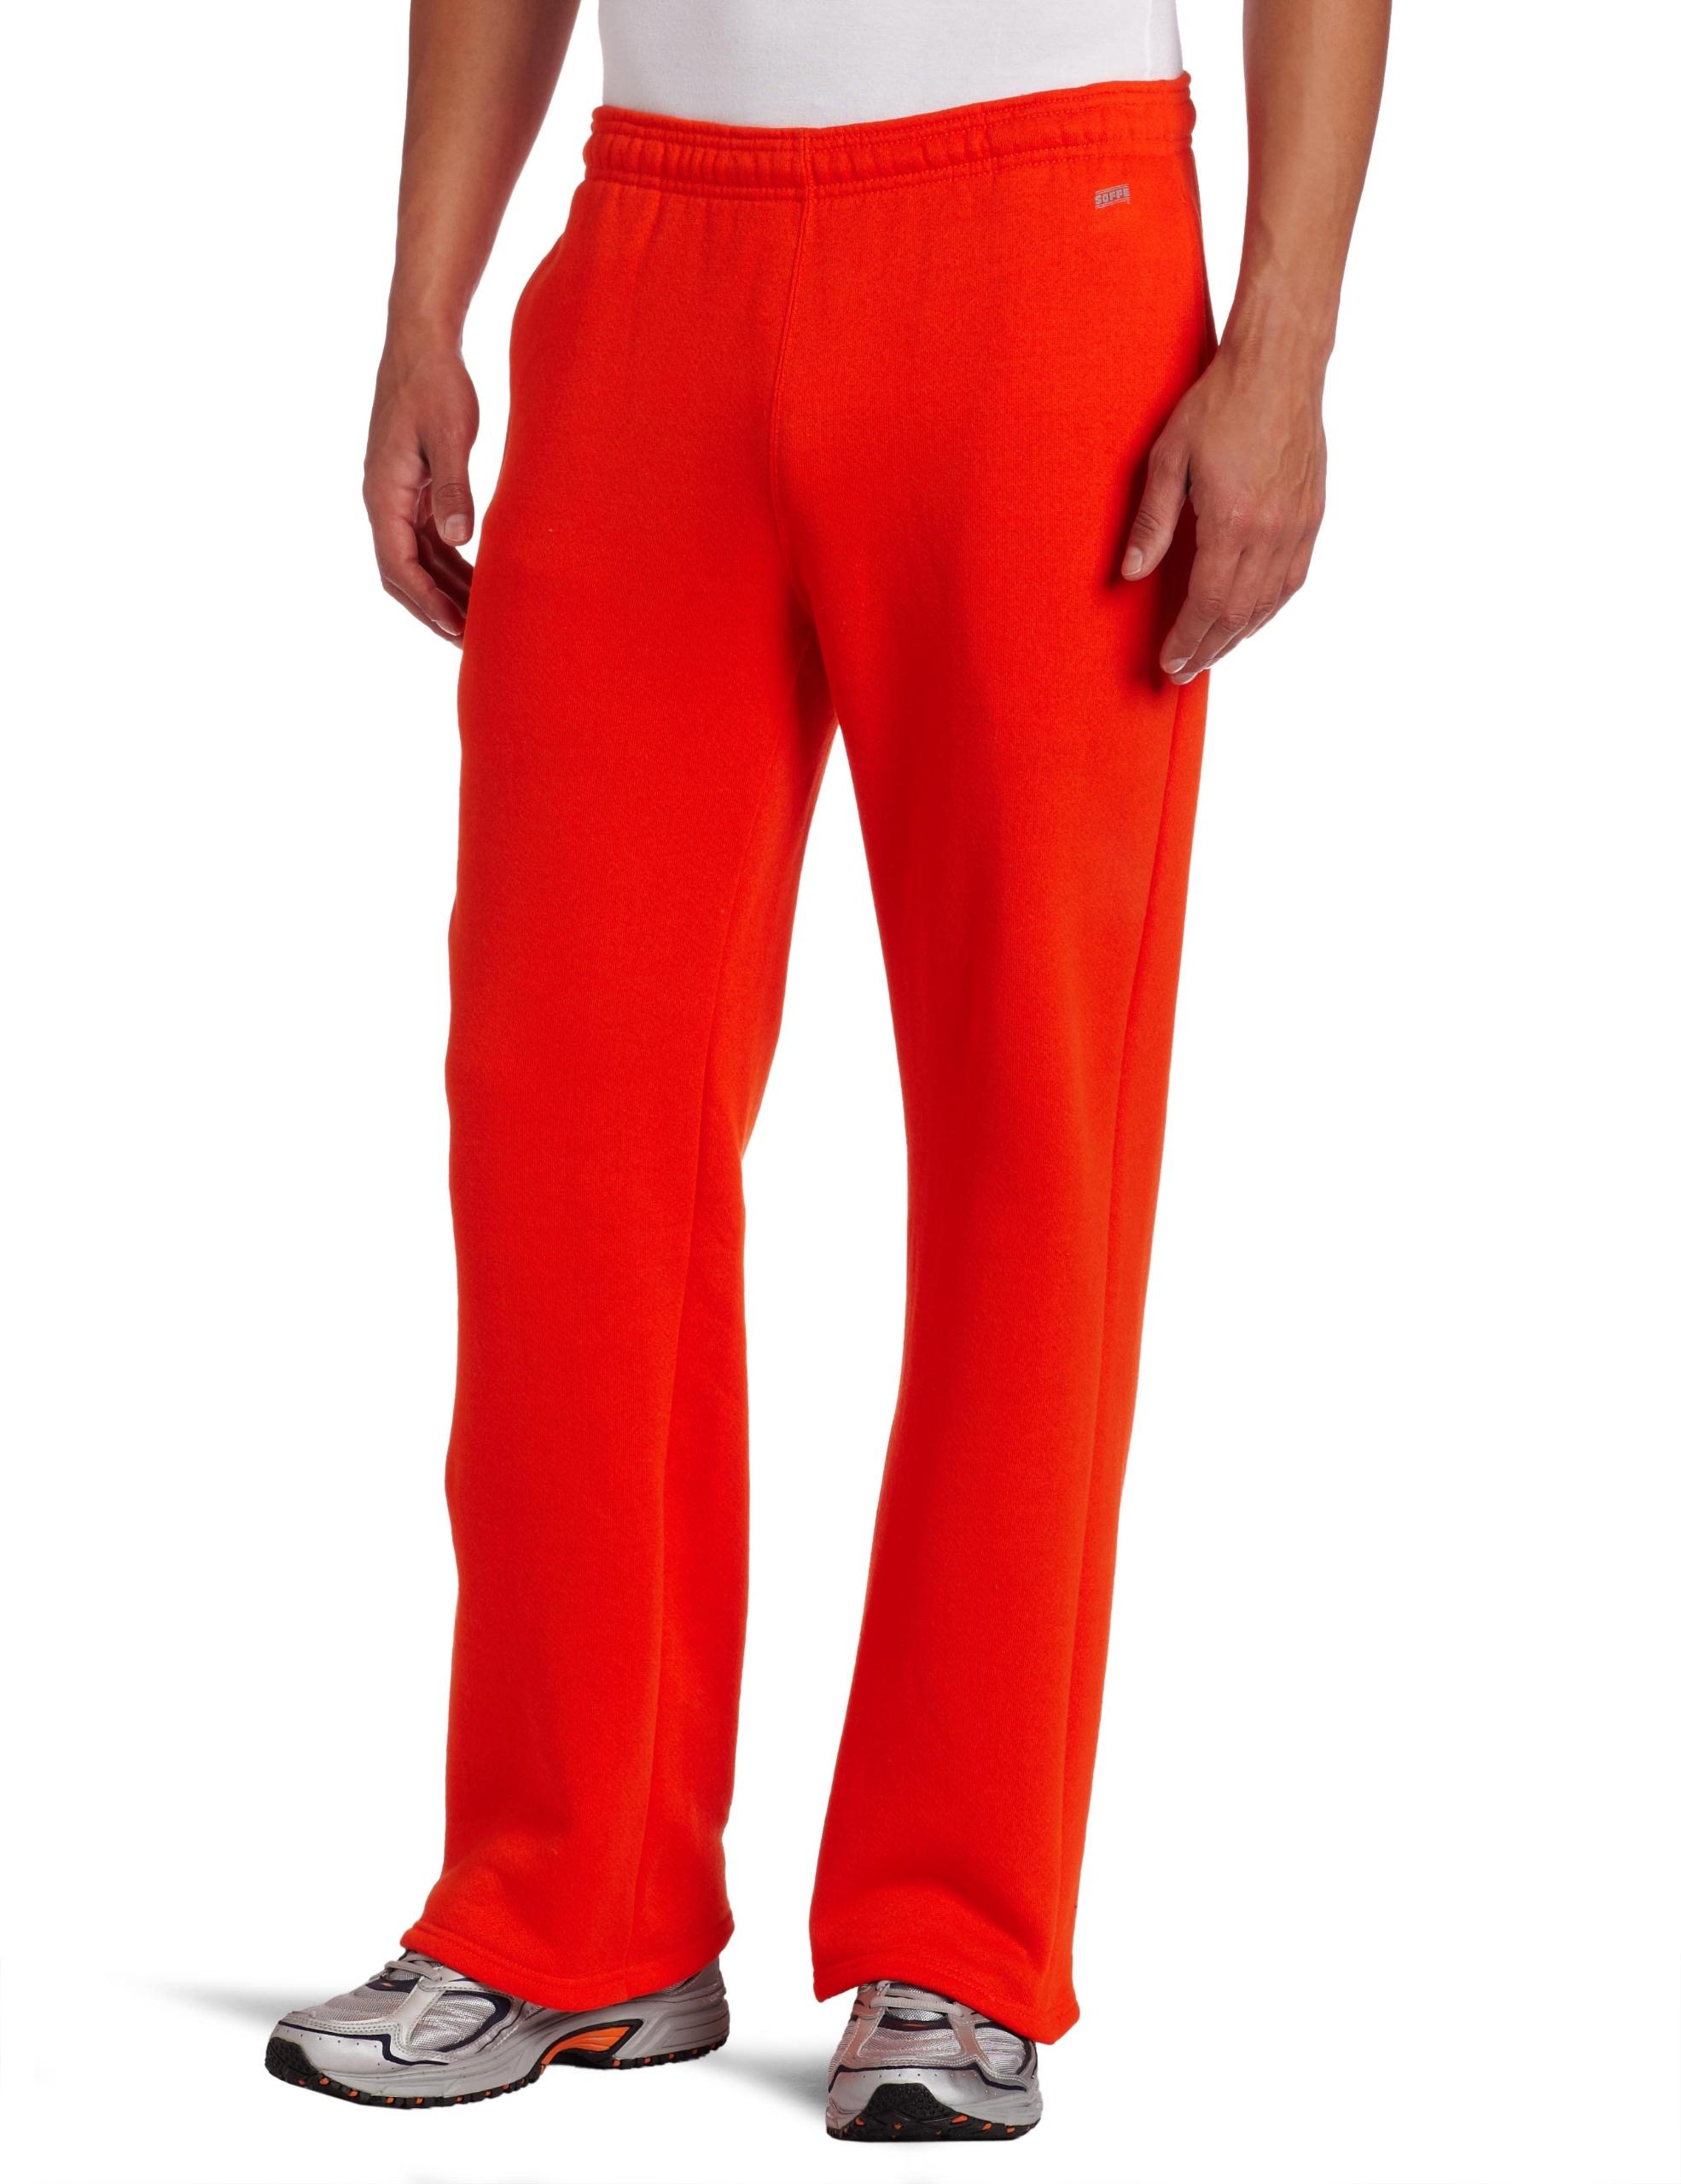 Soffe MJ Men's Training Fleece Pocket Pant, Orange, Small